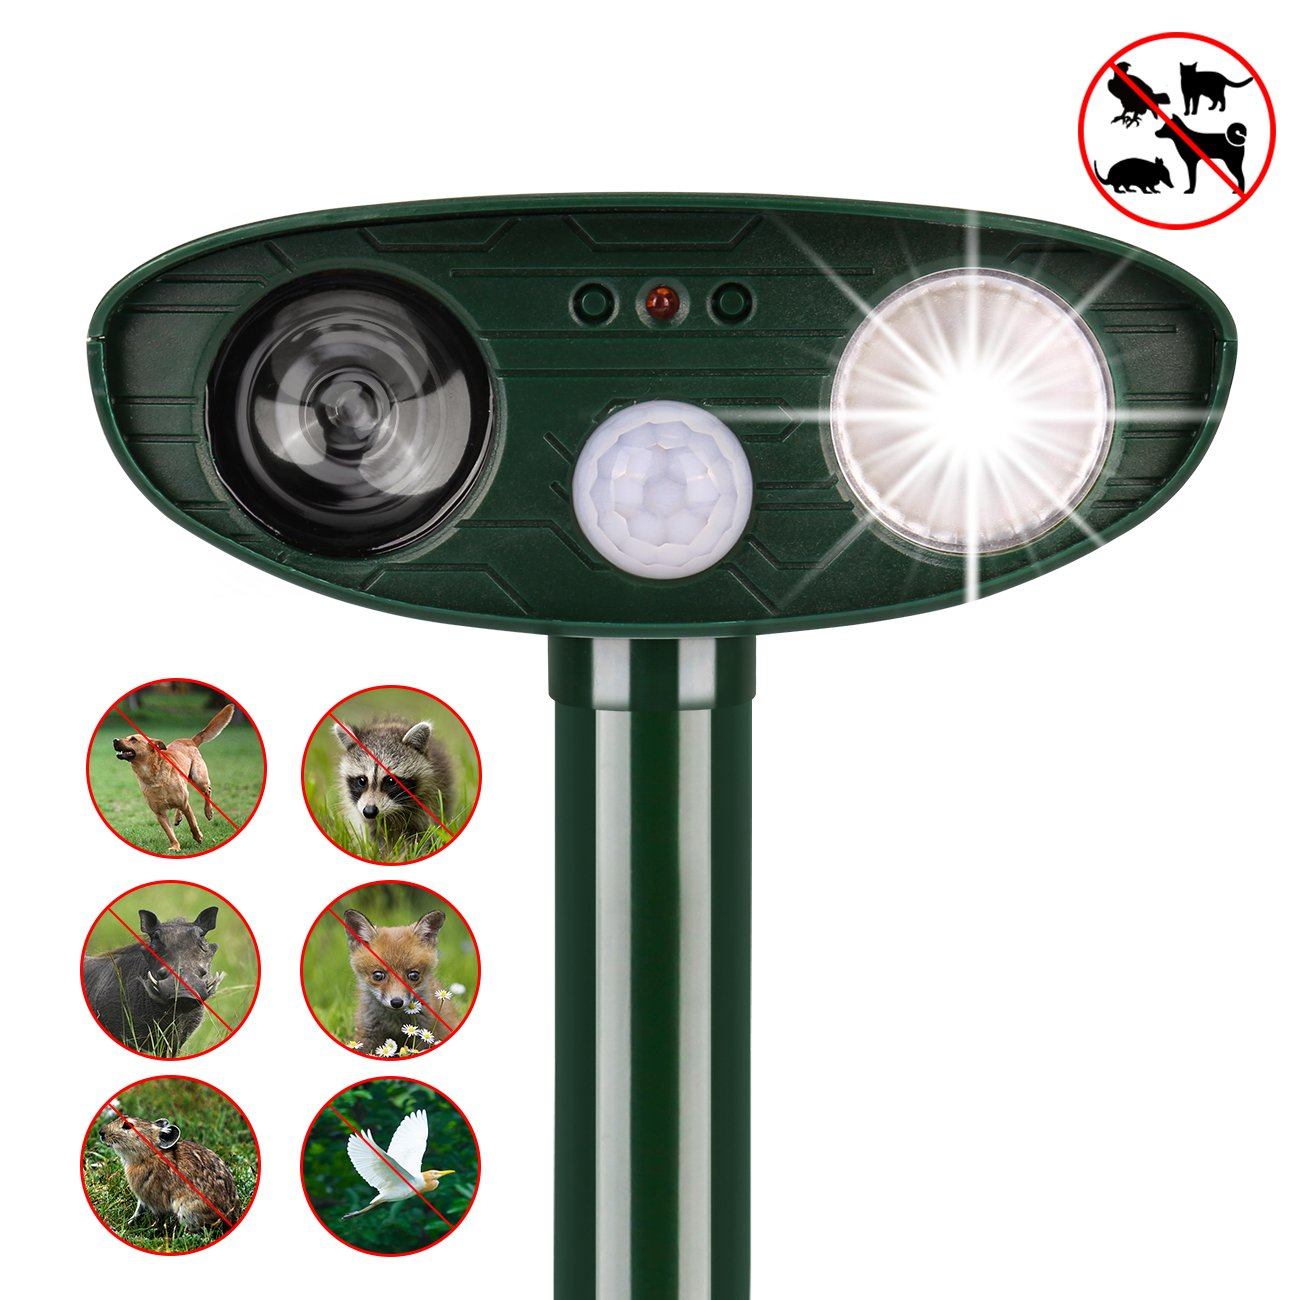 instecho Dog Repellent, Outdoor Solar Powered and Weatherproof Ultrasonic Dog/Cat/Mosquito Repeller